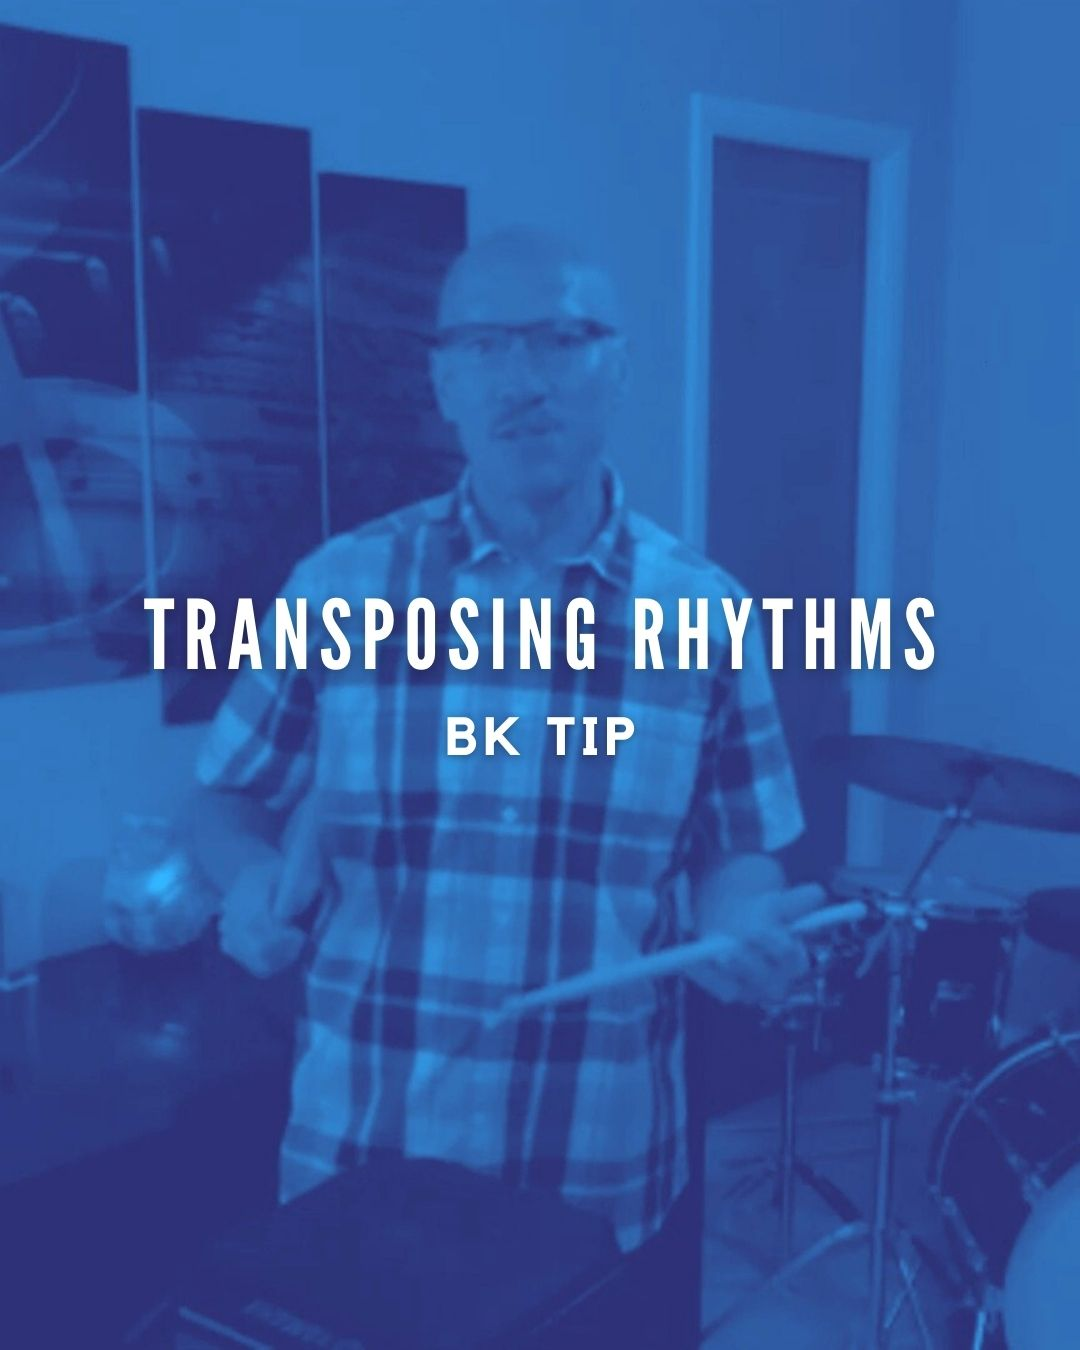 Transposing Rhythms